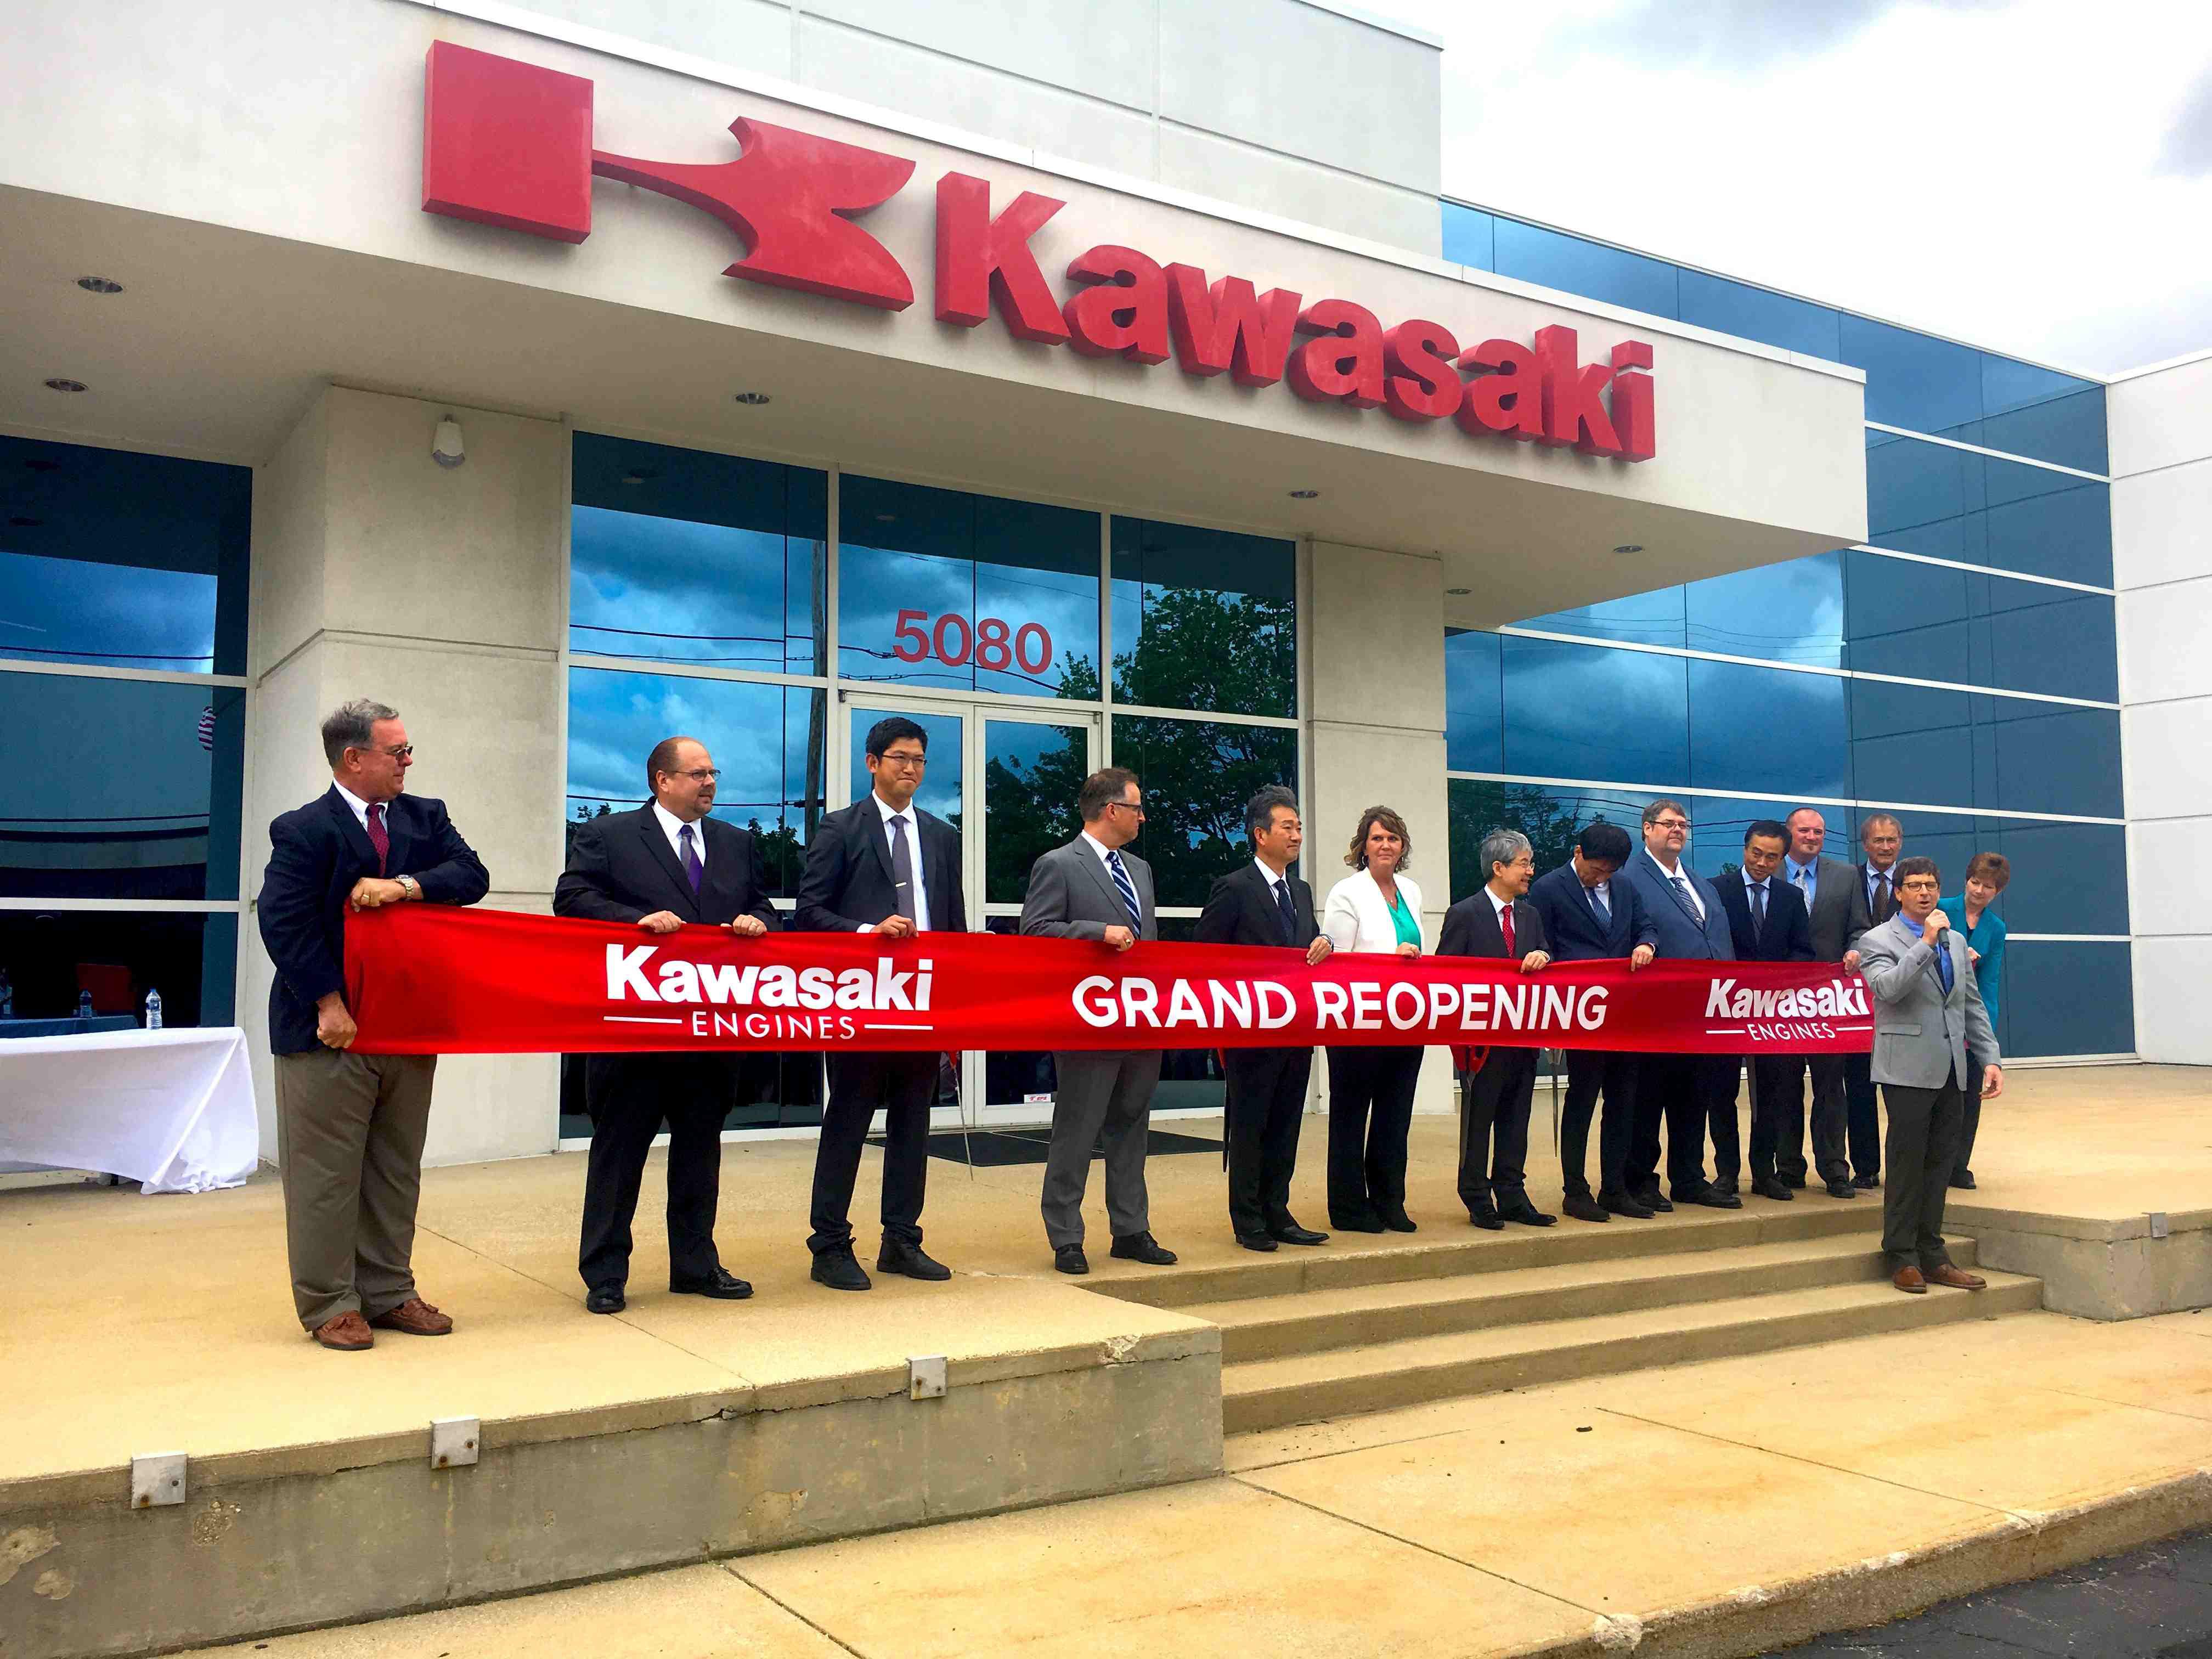 kawasaki grand reopening with managers and executives